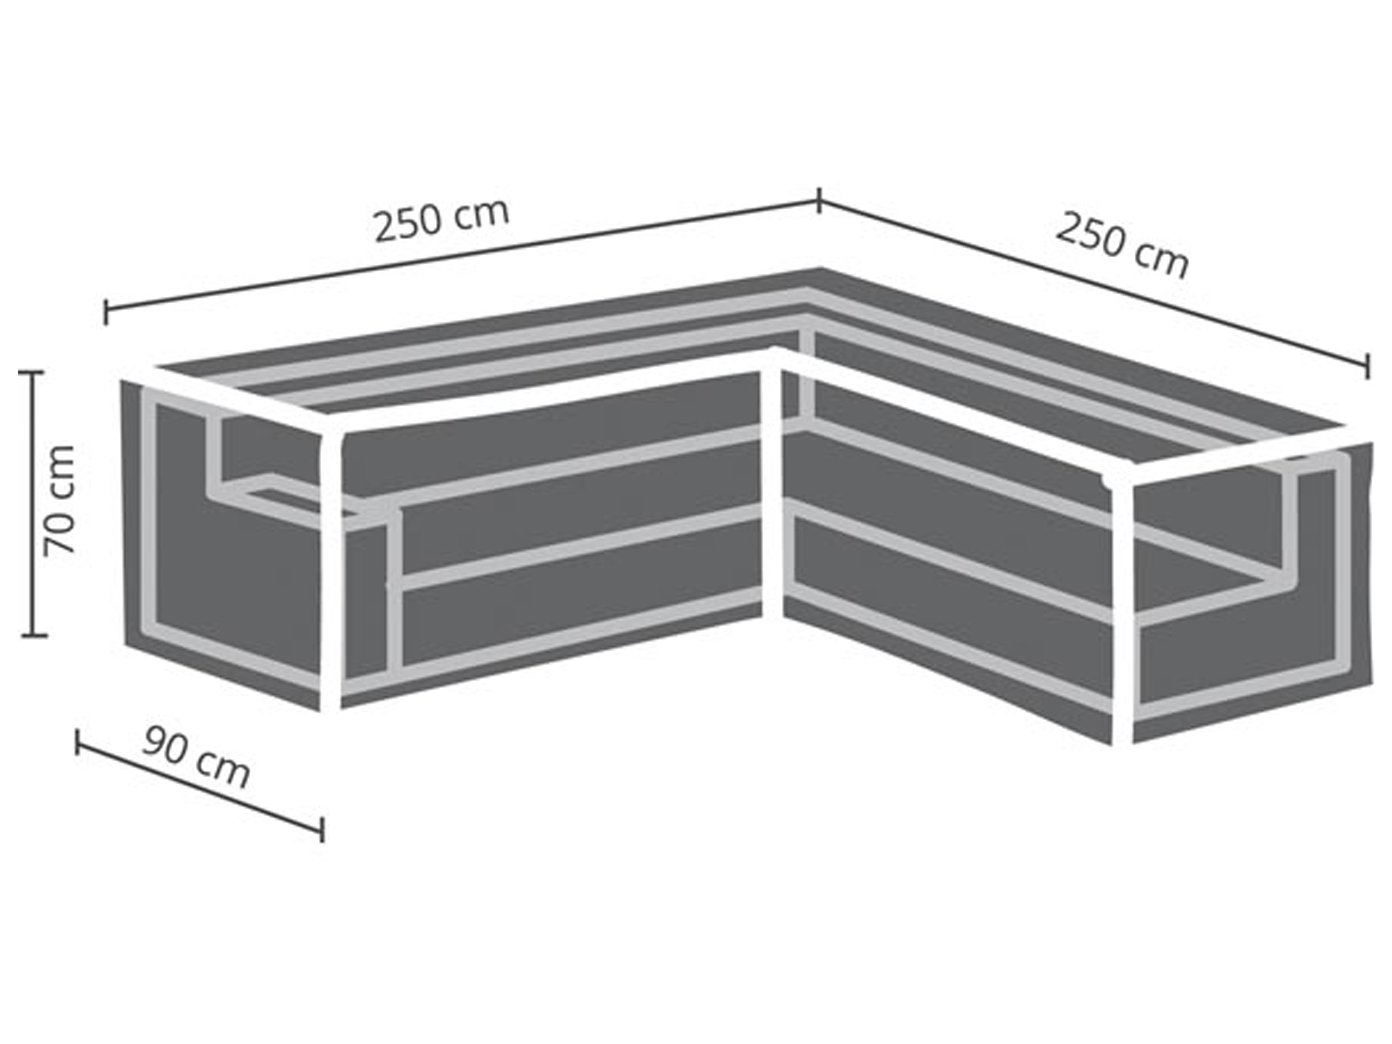 Amazon.de: Perel Garden OCLSL250 Schutzhülle Für L-Förmiges Lounge ...